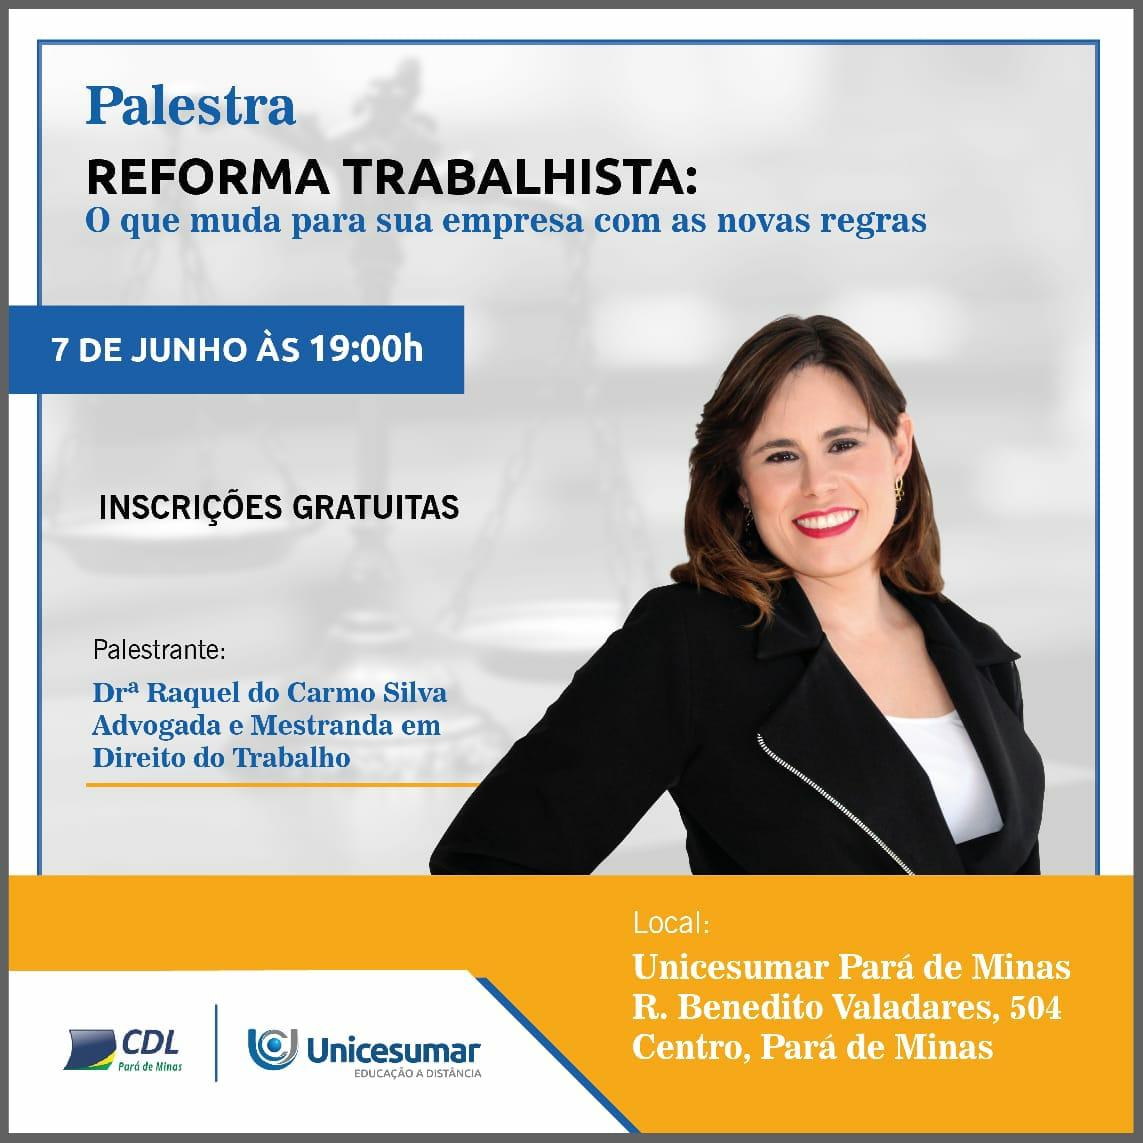 PALESTRA REFORMA TRABALHISTA